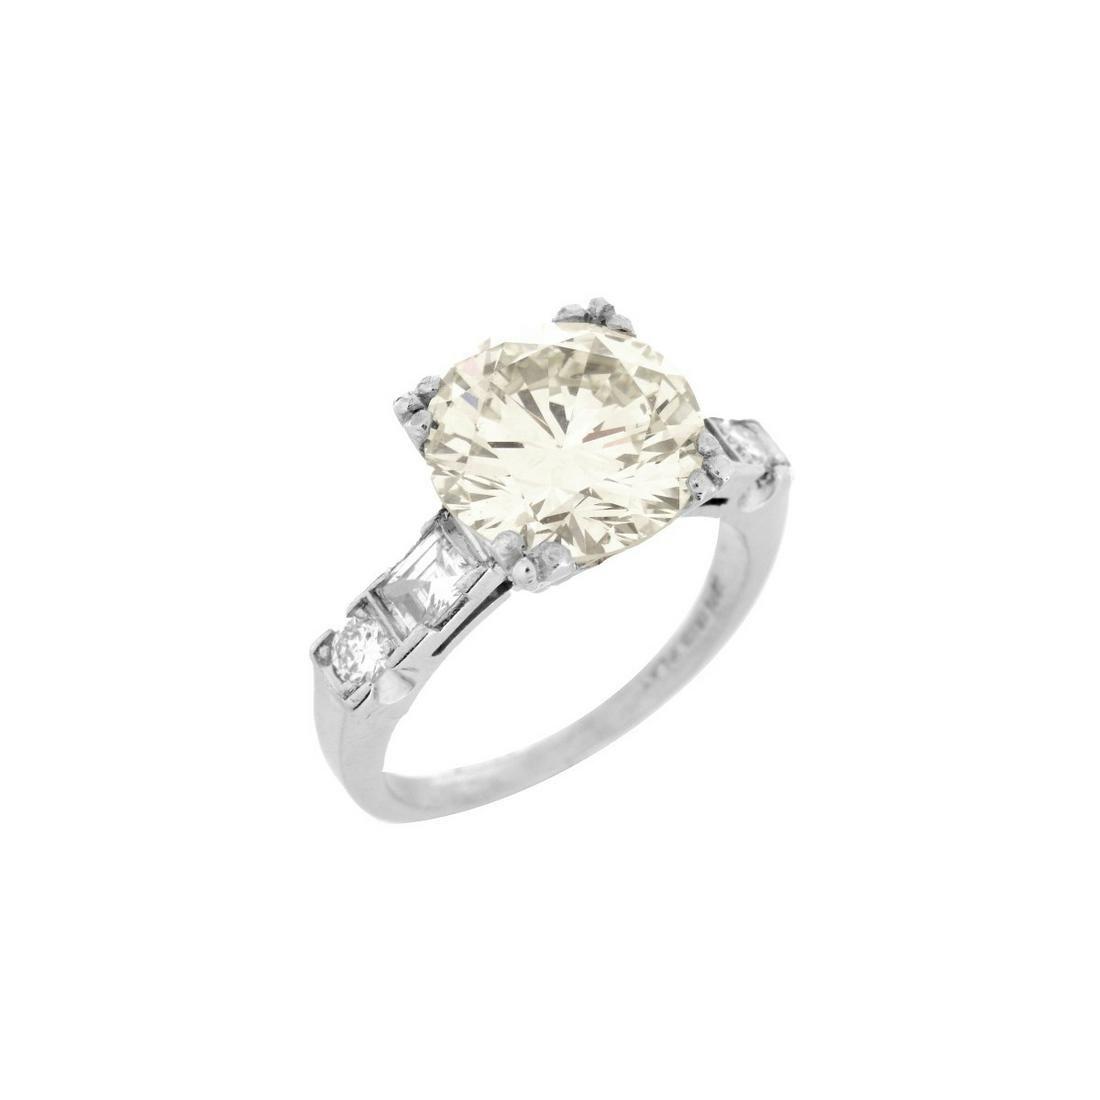 4.38 Carat Diamond and Platinum Ring